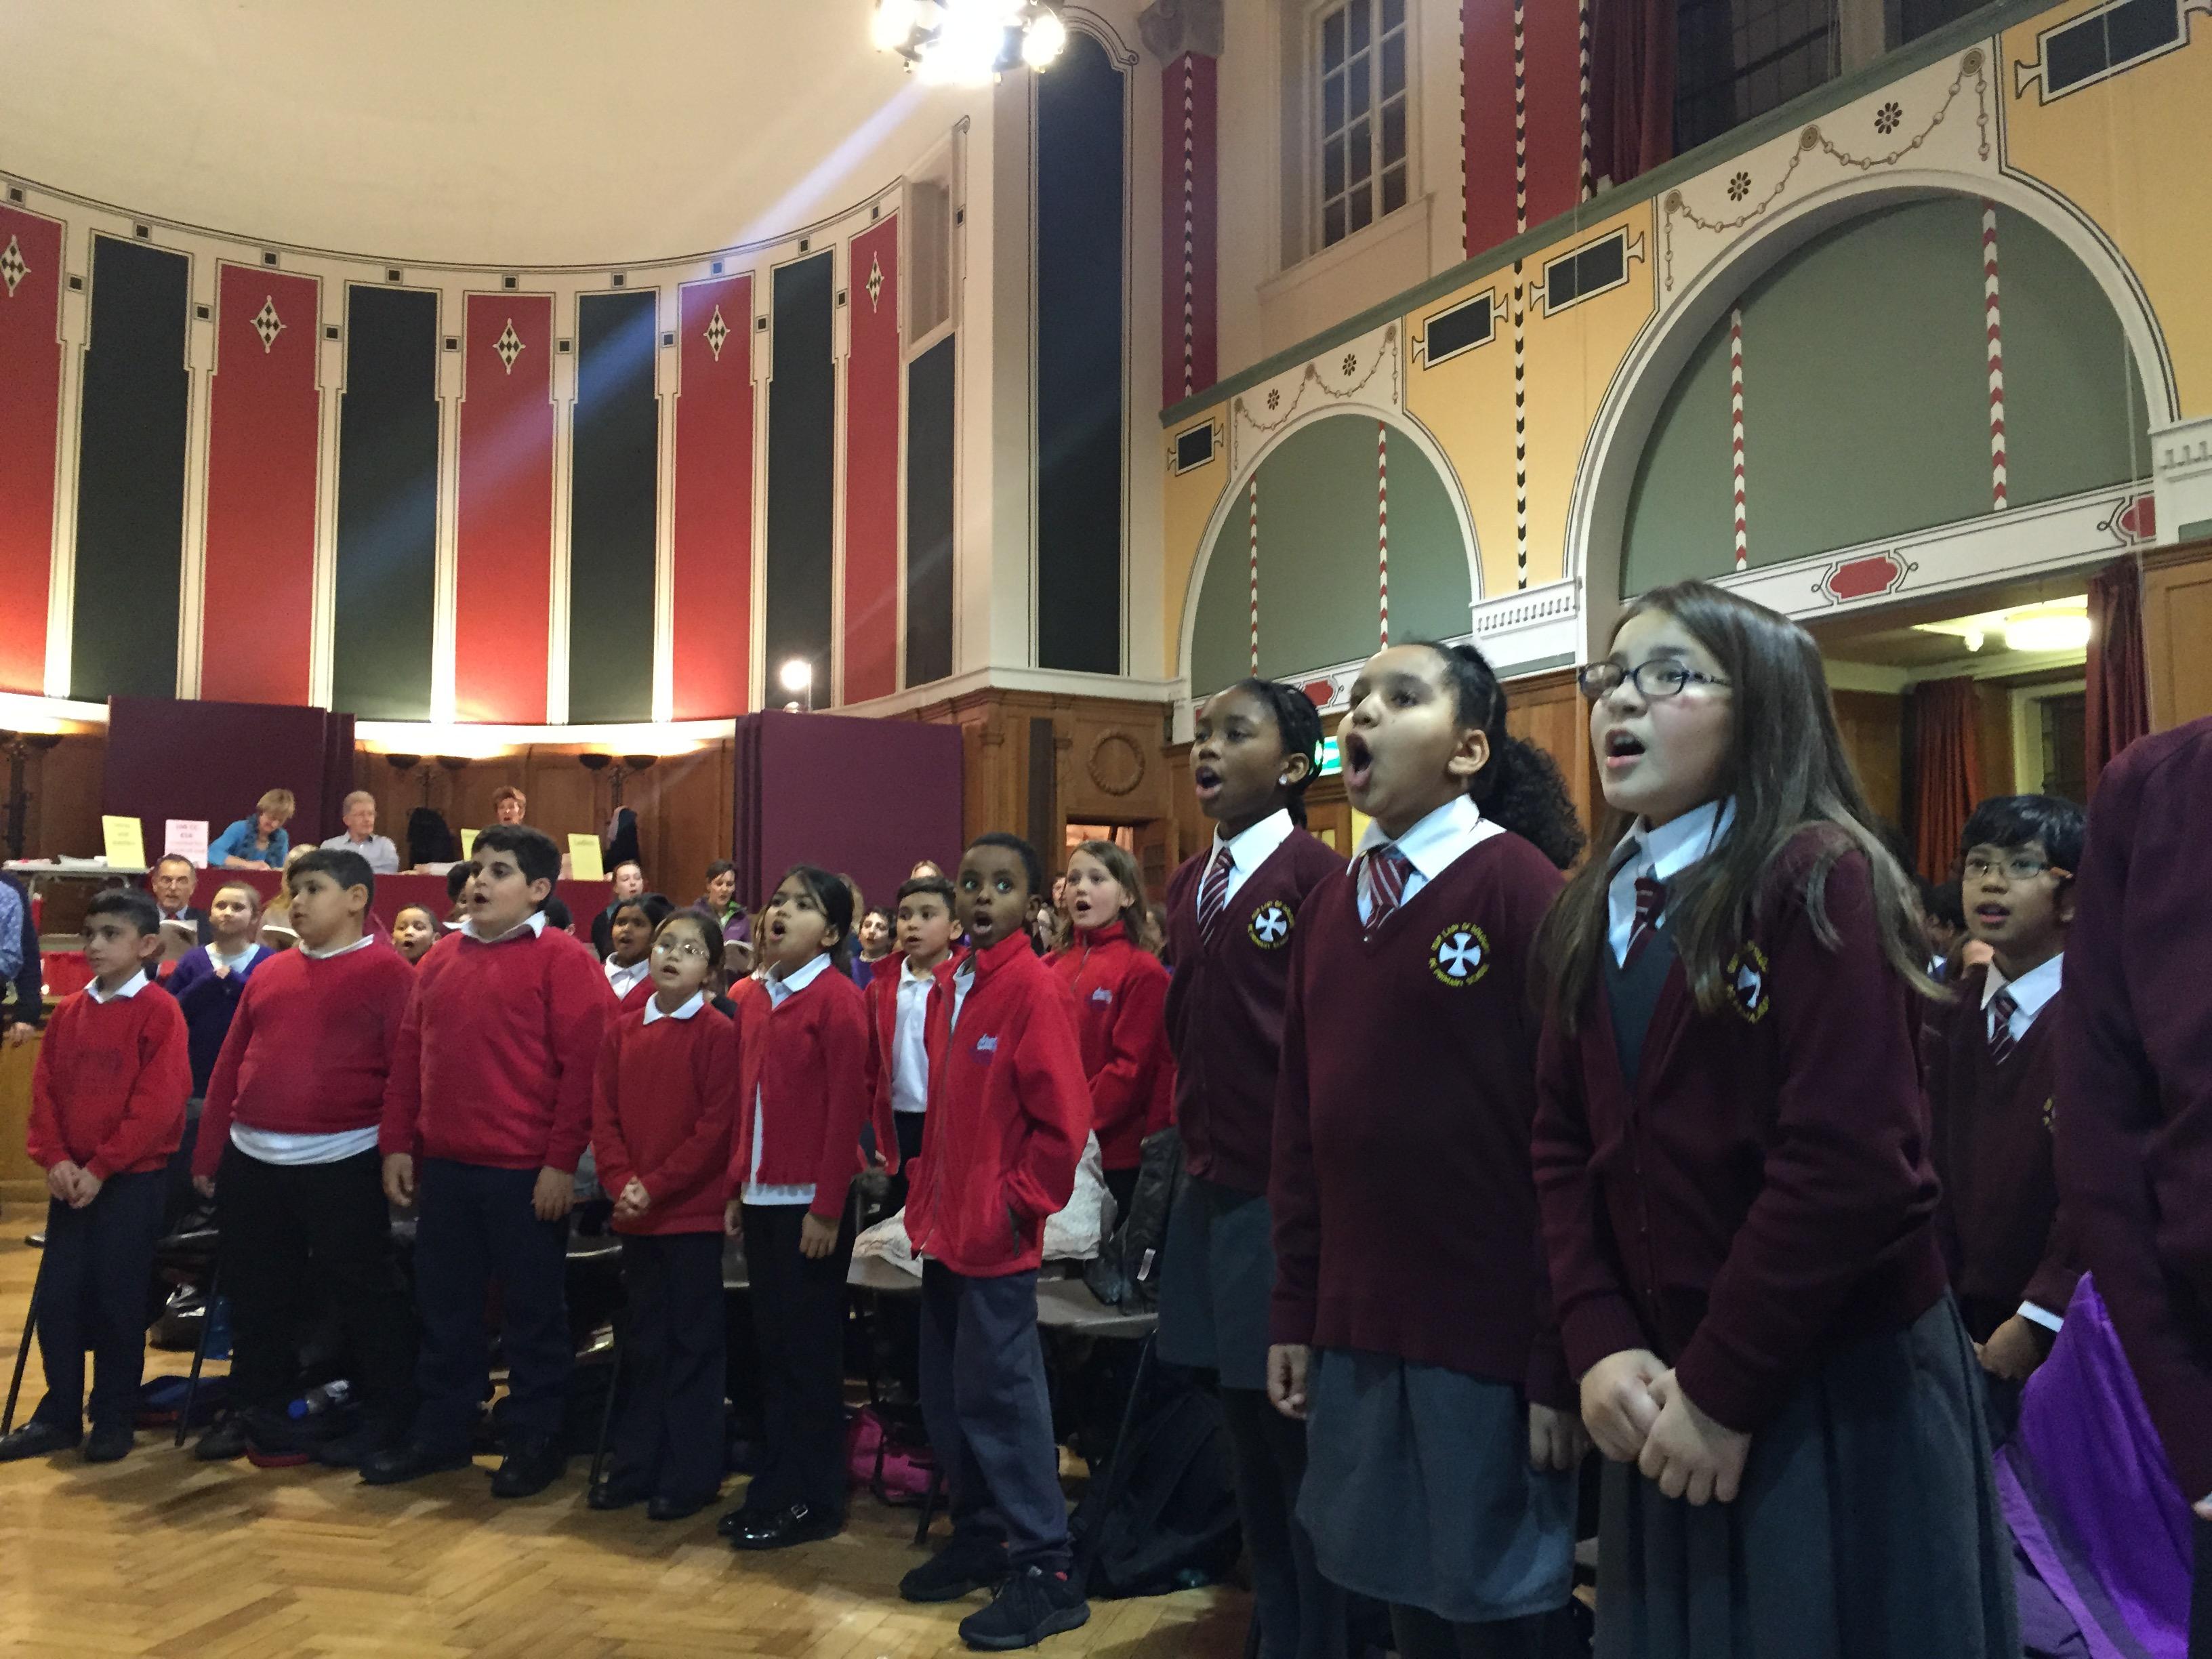 Children S Choir Christmas Songs